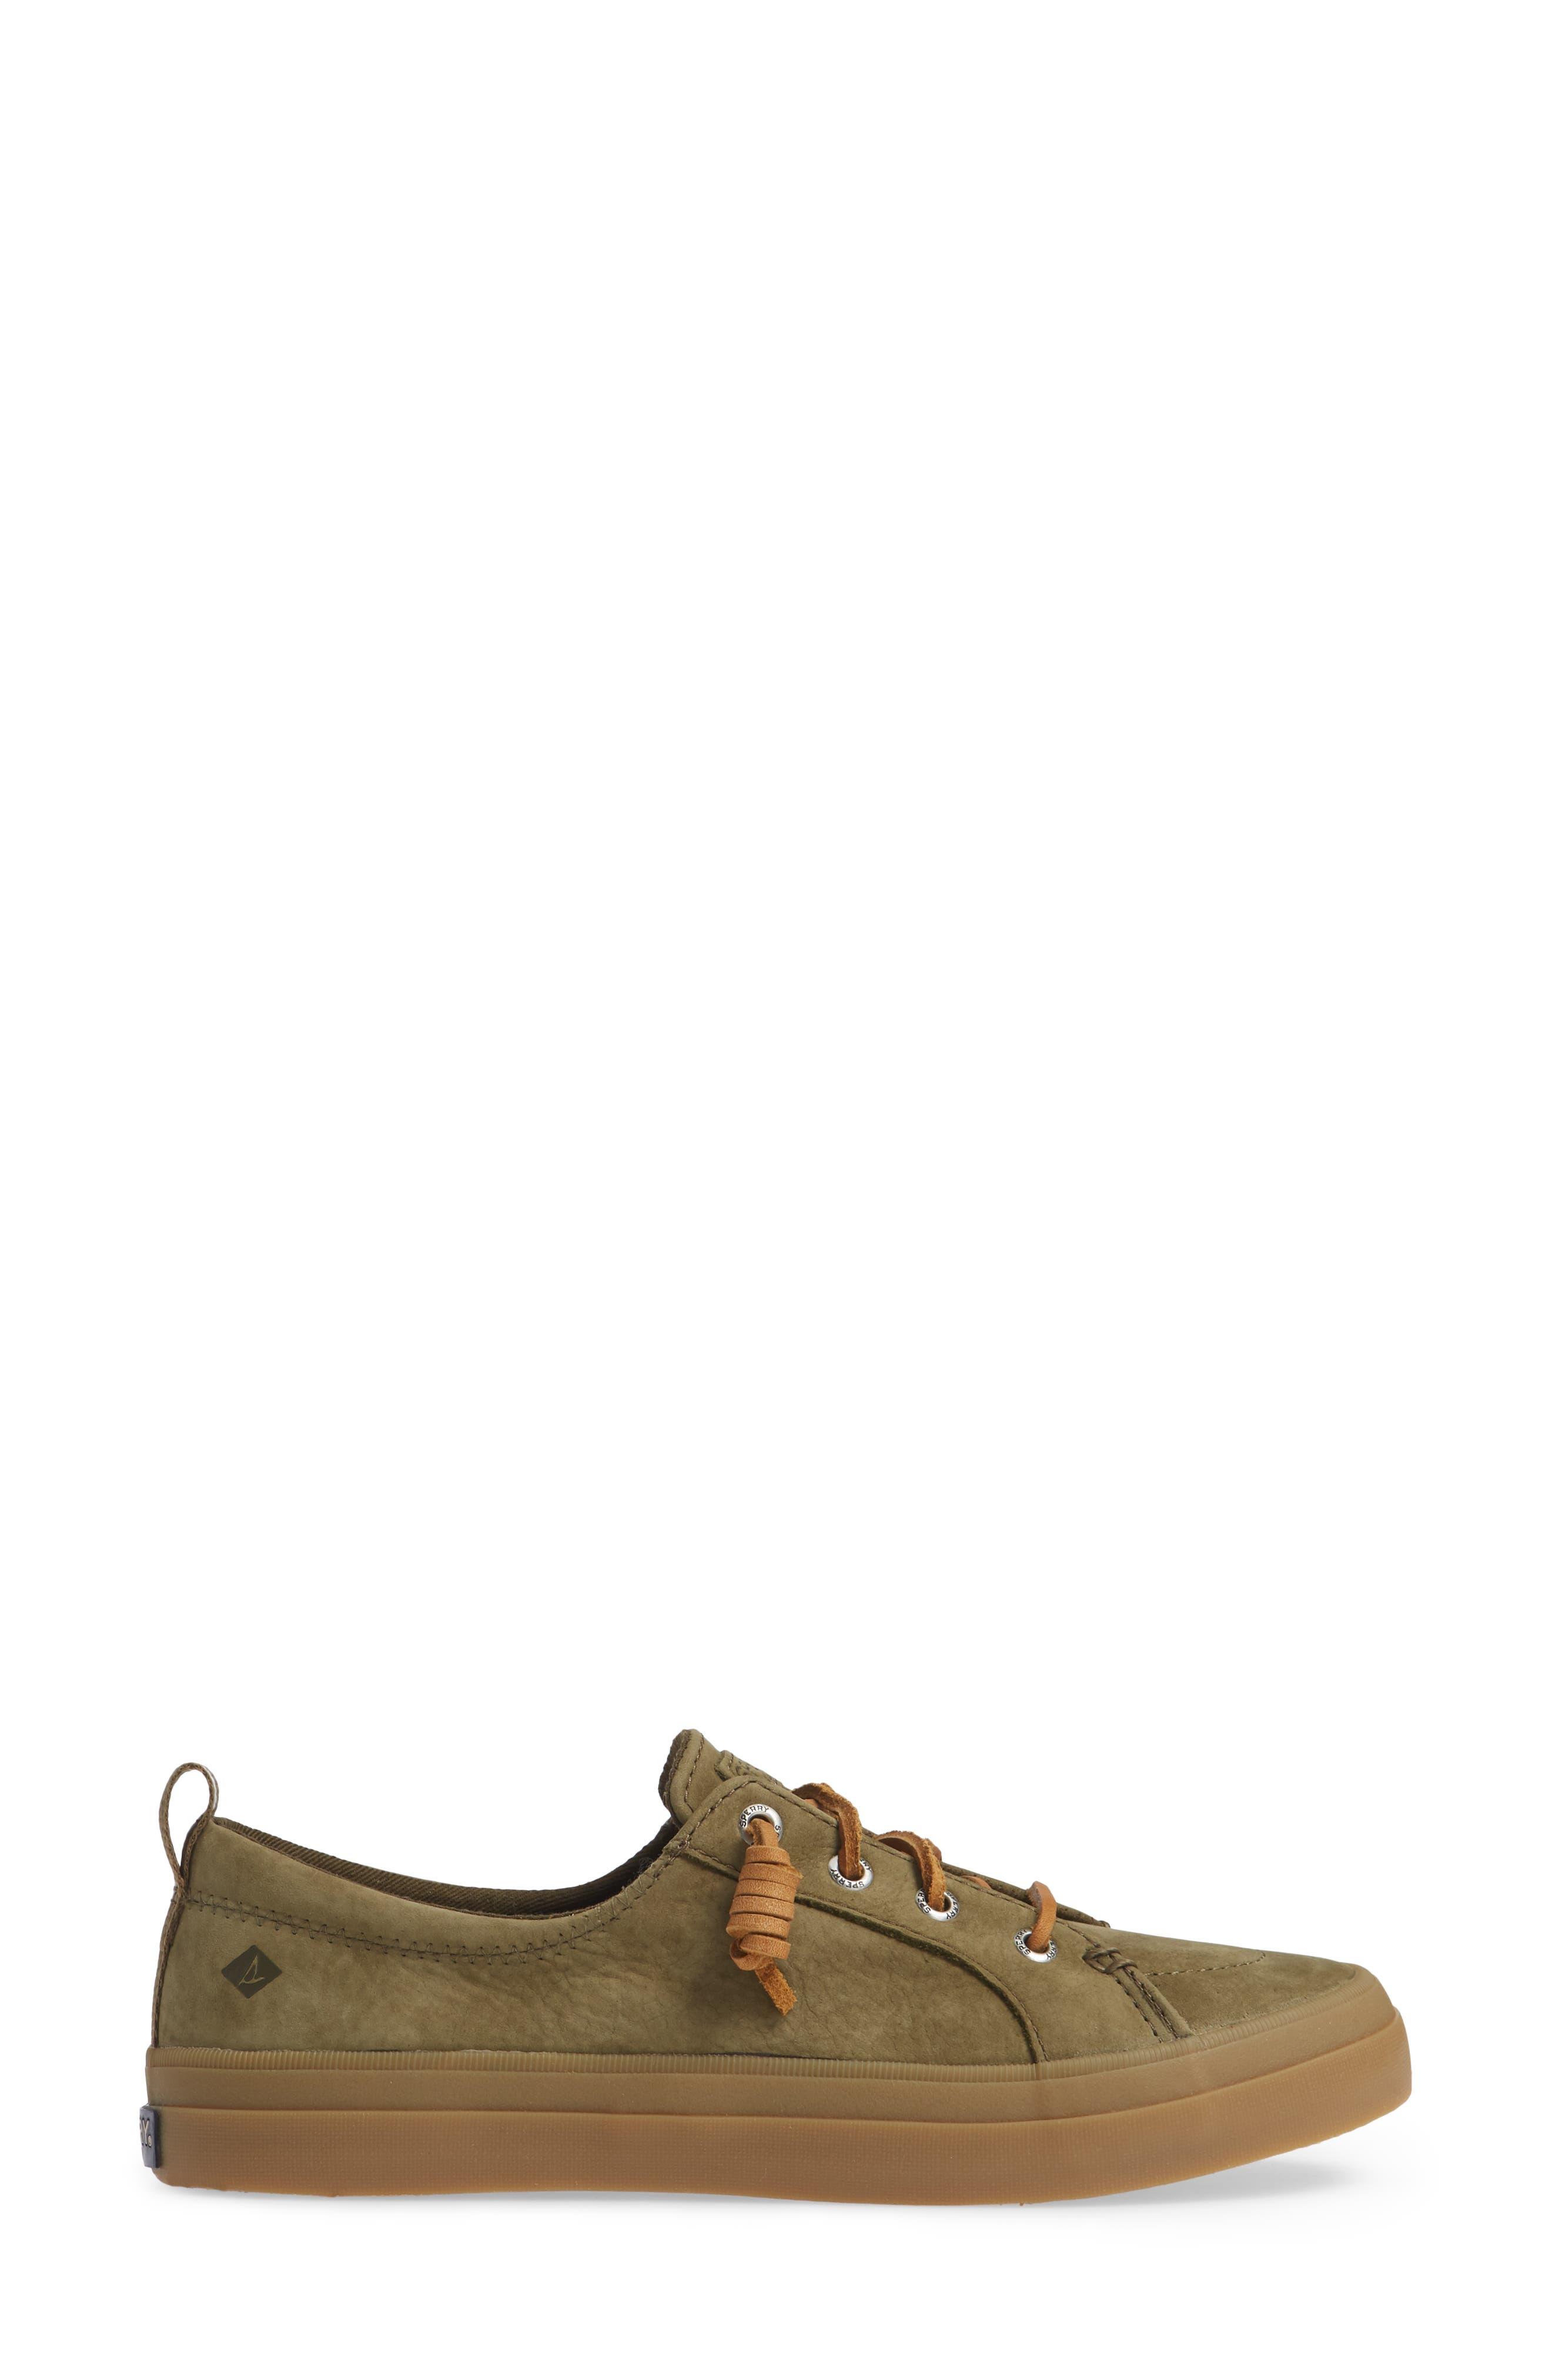 Crest Vibe Sneaker,                             Alternate thumbnail 3, color,                             OLIVE LEATHER